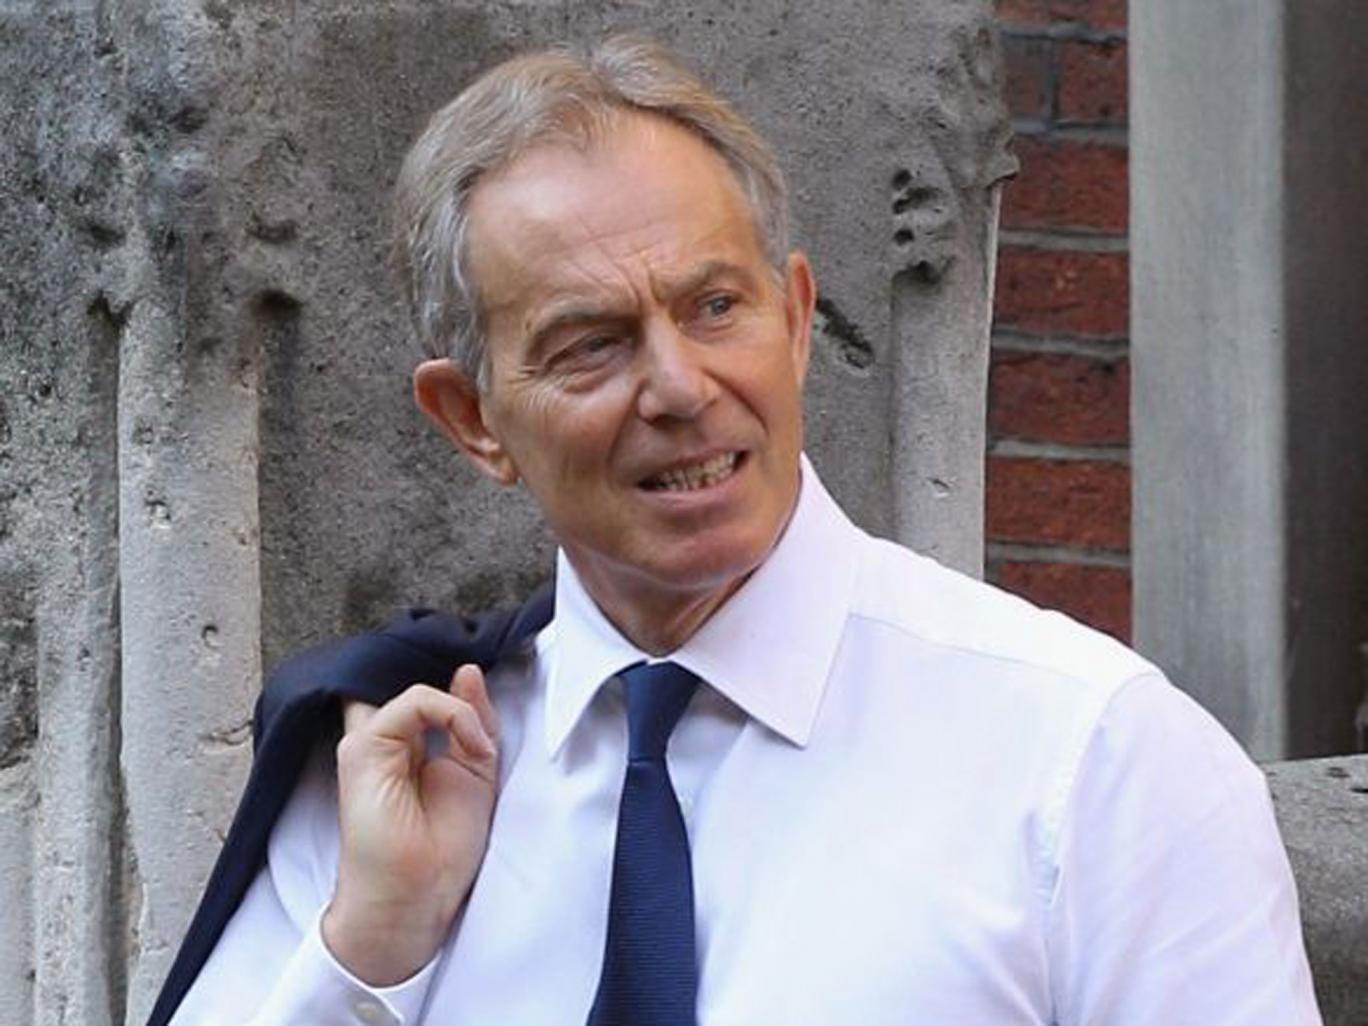 Ol' blue eyes: former PM Tony Blair